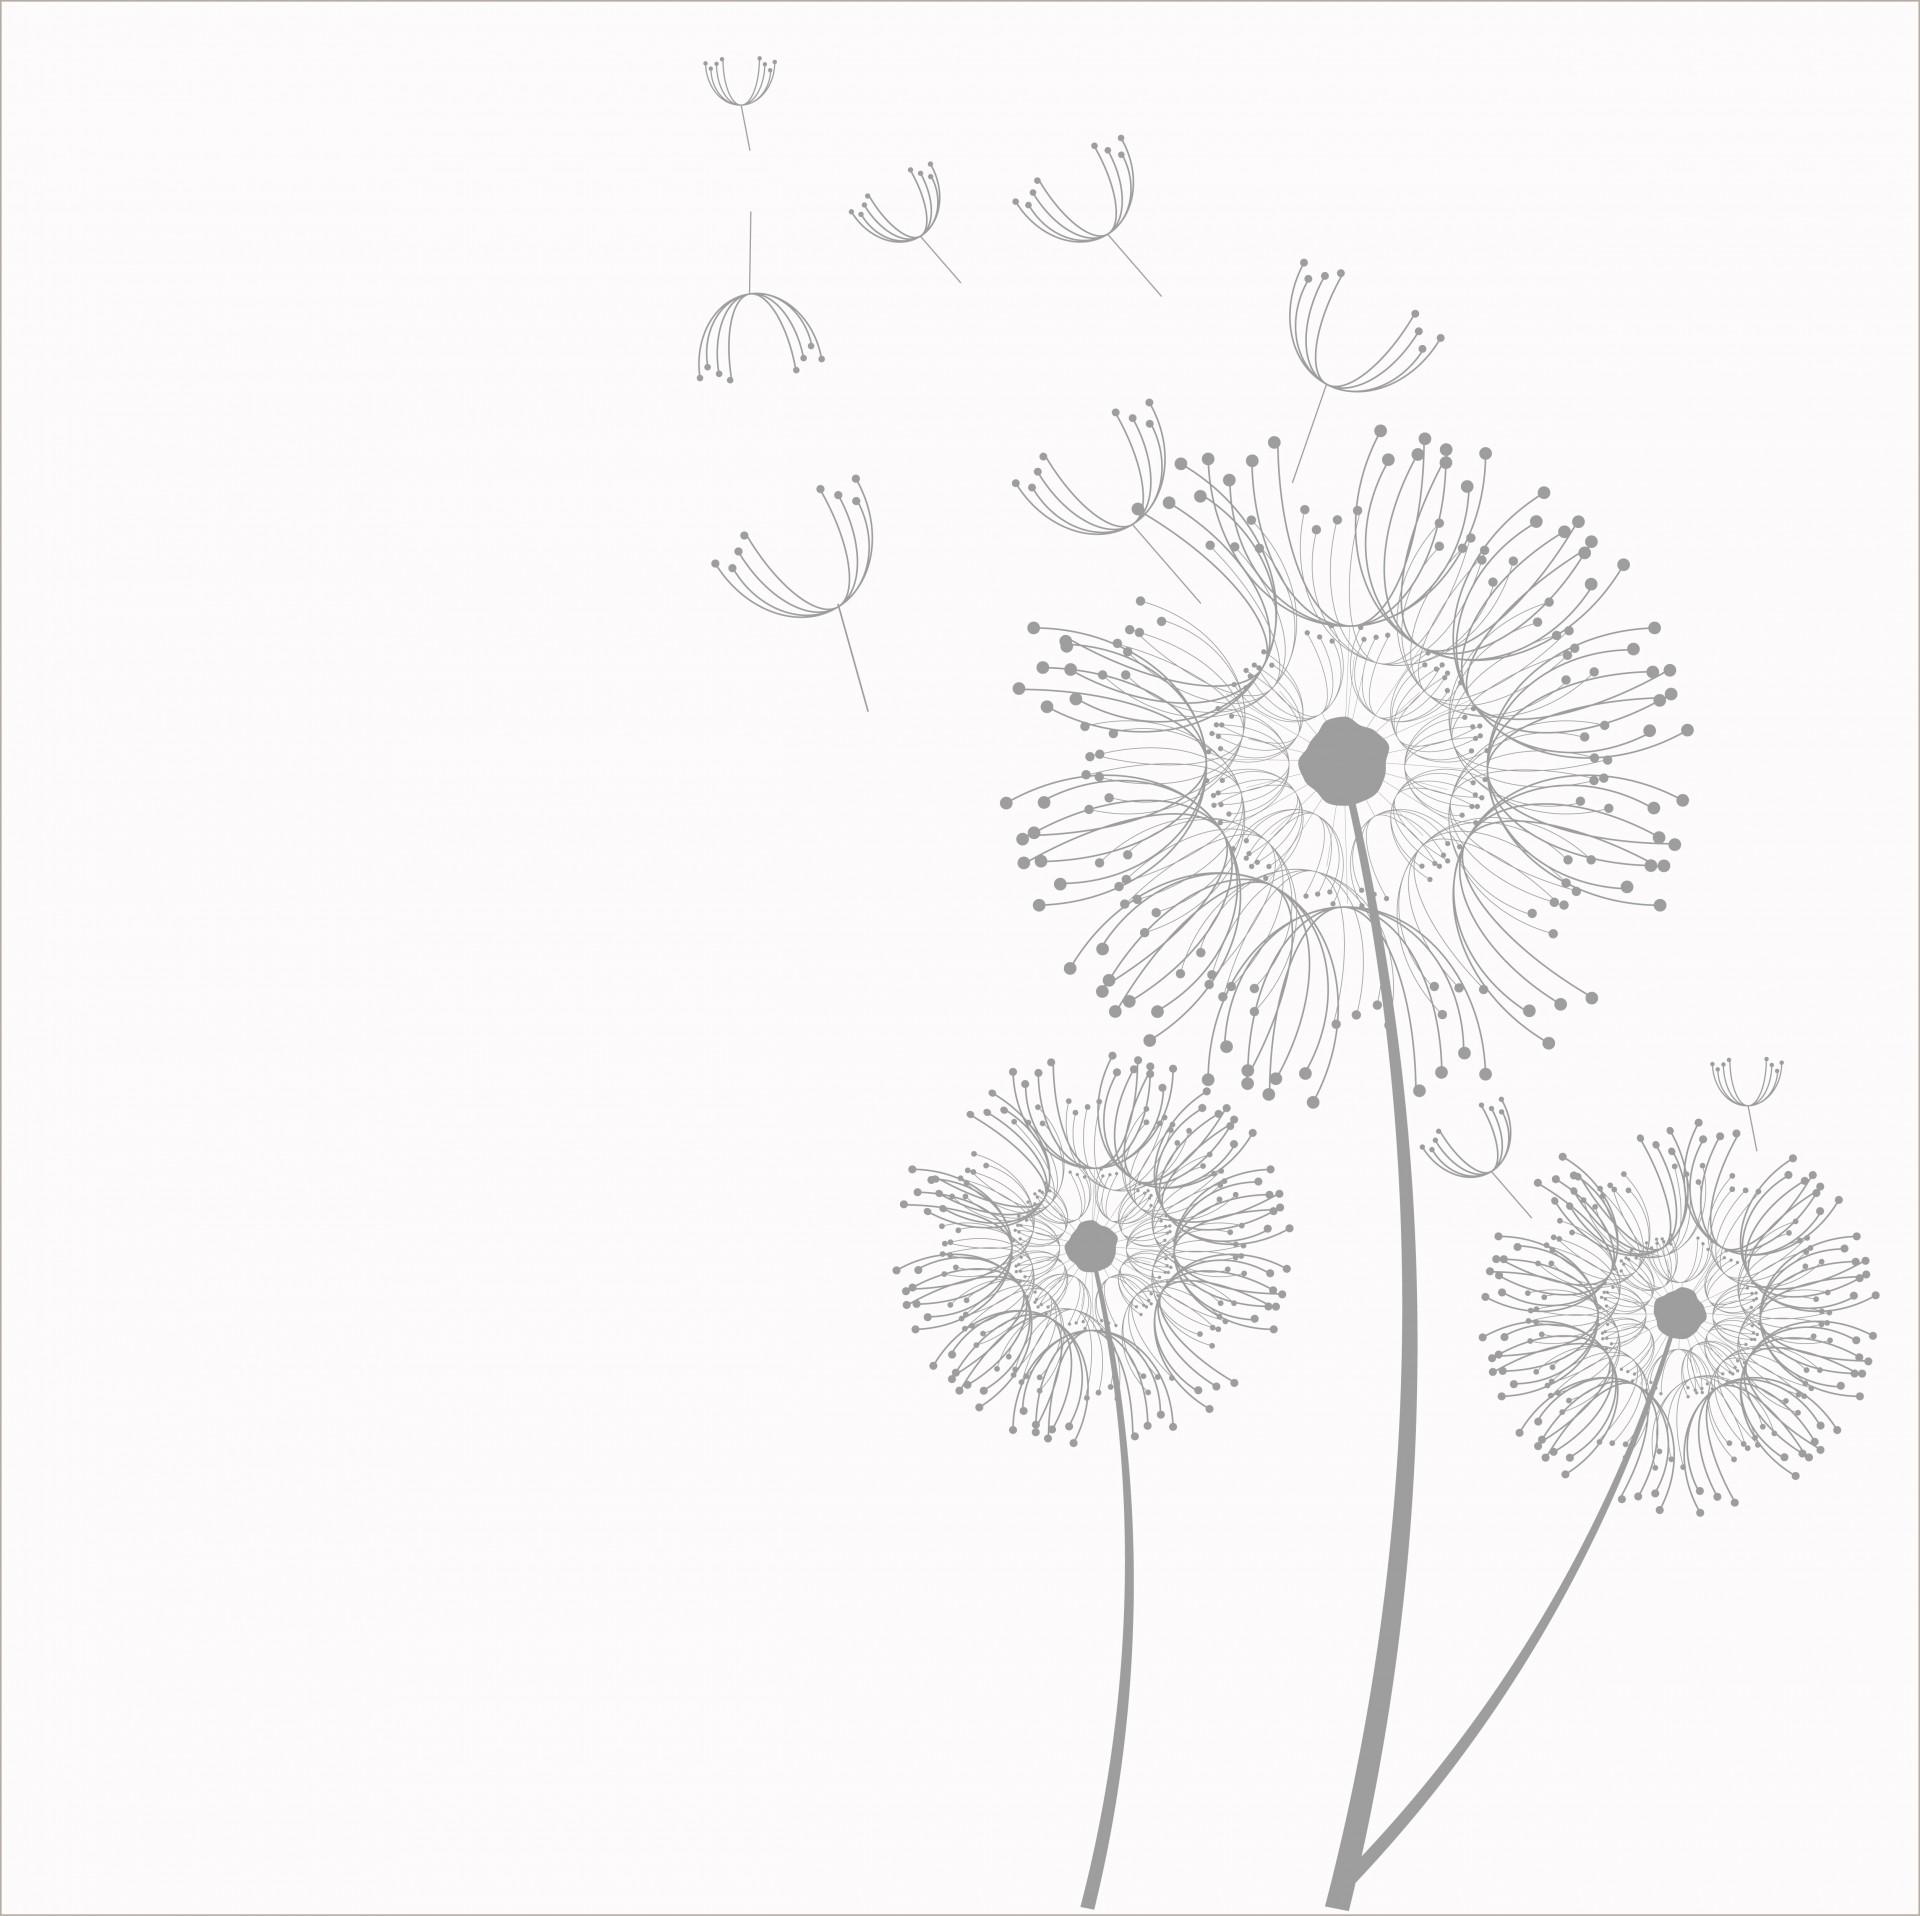 Free Dandelions Cliparts, Download Free Clip Art, Free Clip.